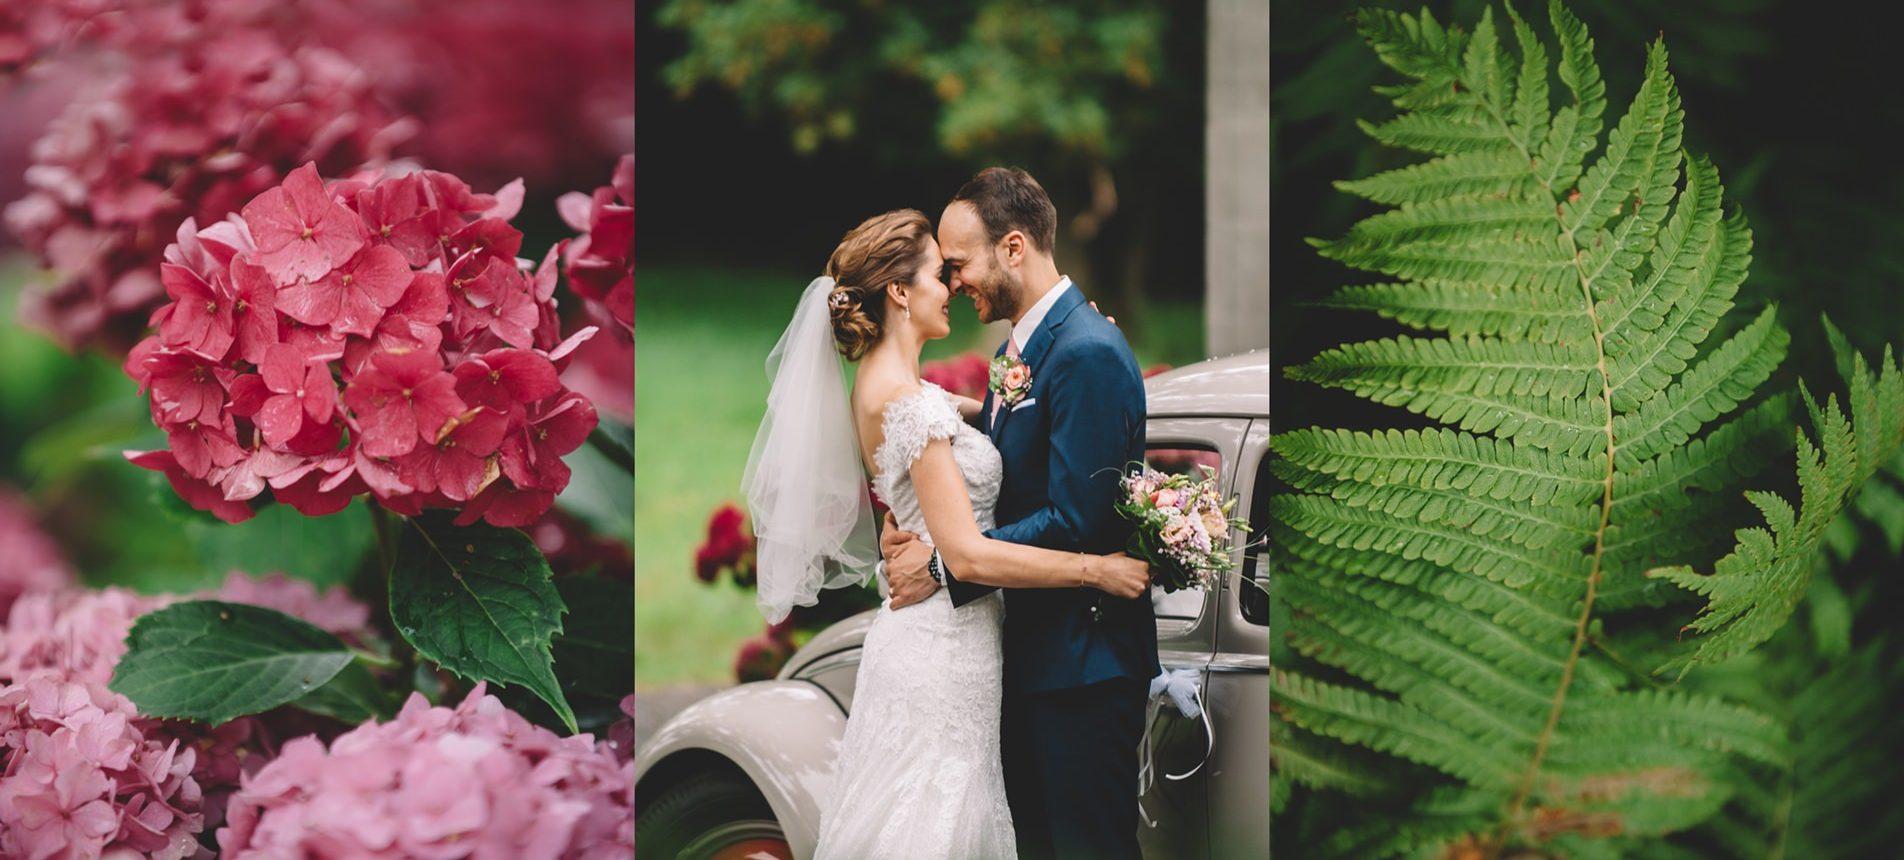 monika breitenmoser photographe mariage lausanne